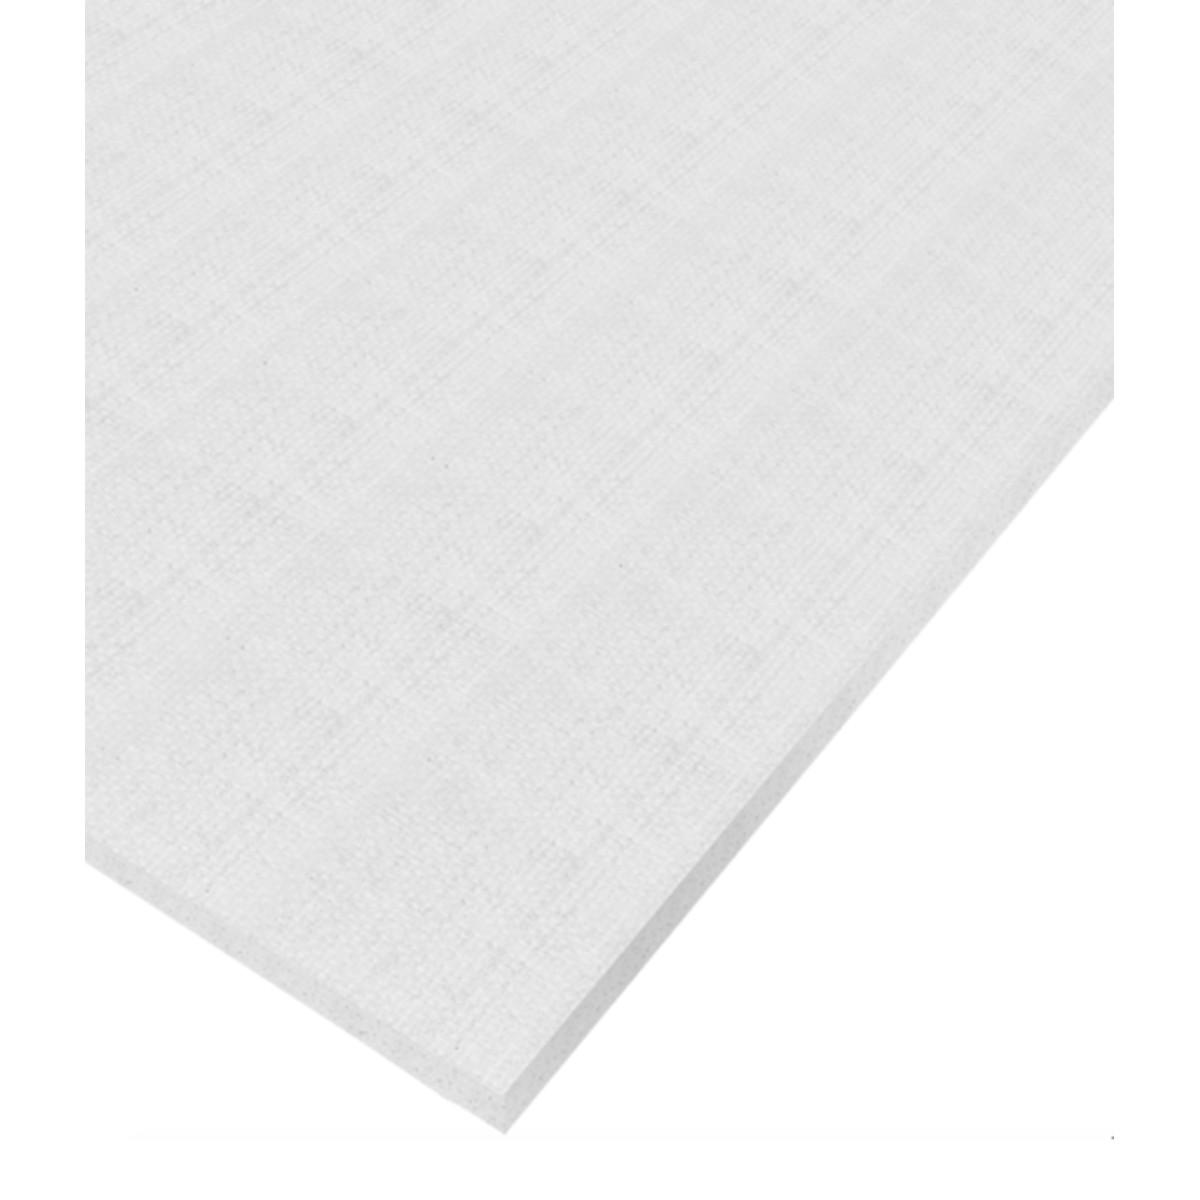 Лист стекломагниевый Magelan Премиум 2440x1220x12 мм